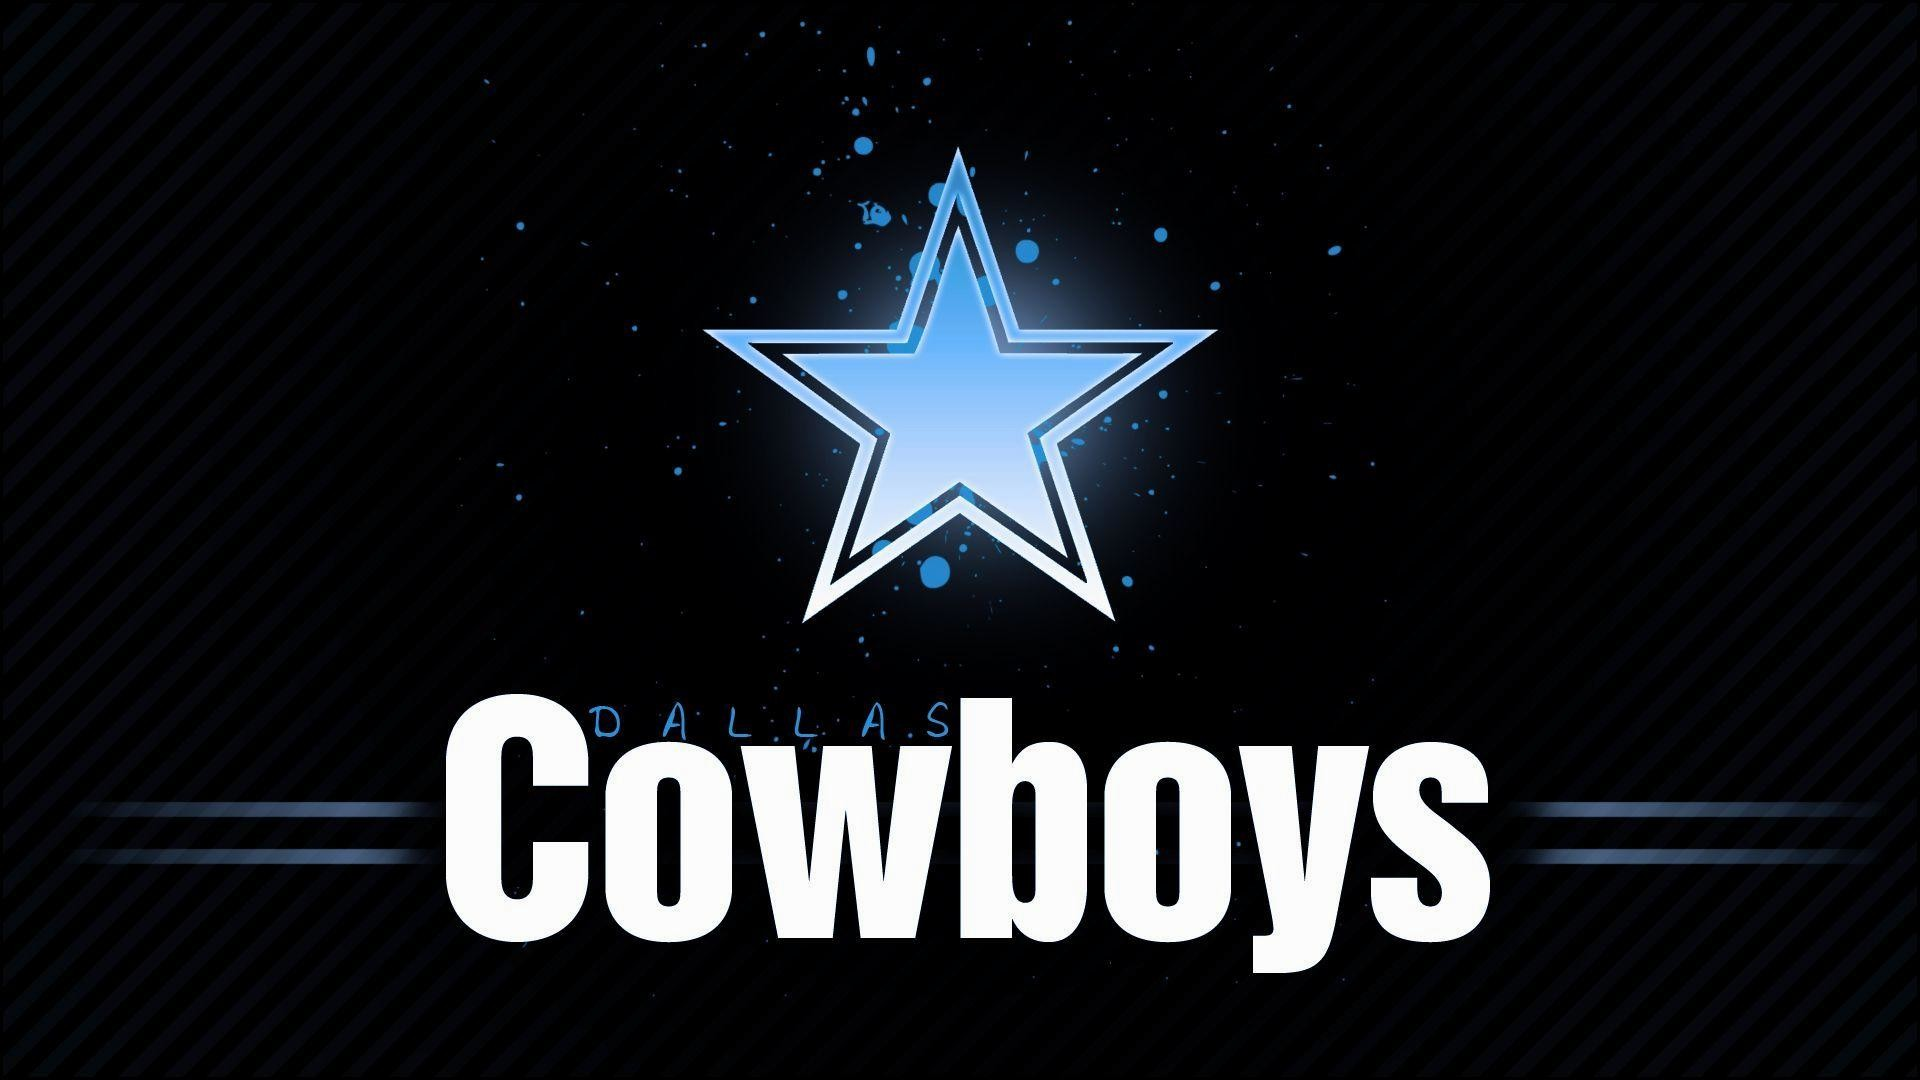 Dallas-Cowboys-HD-Backgrounds-wallpaper-wpt7803480